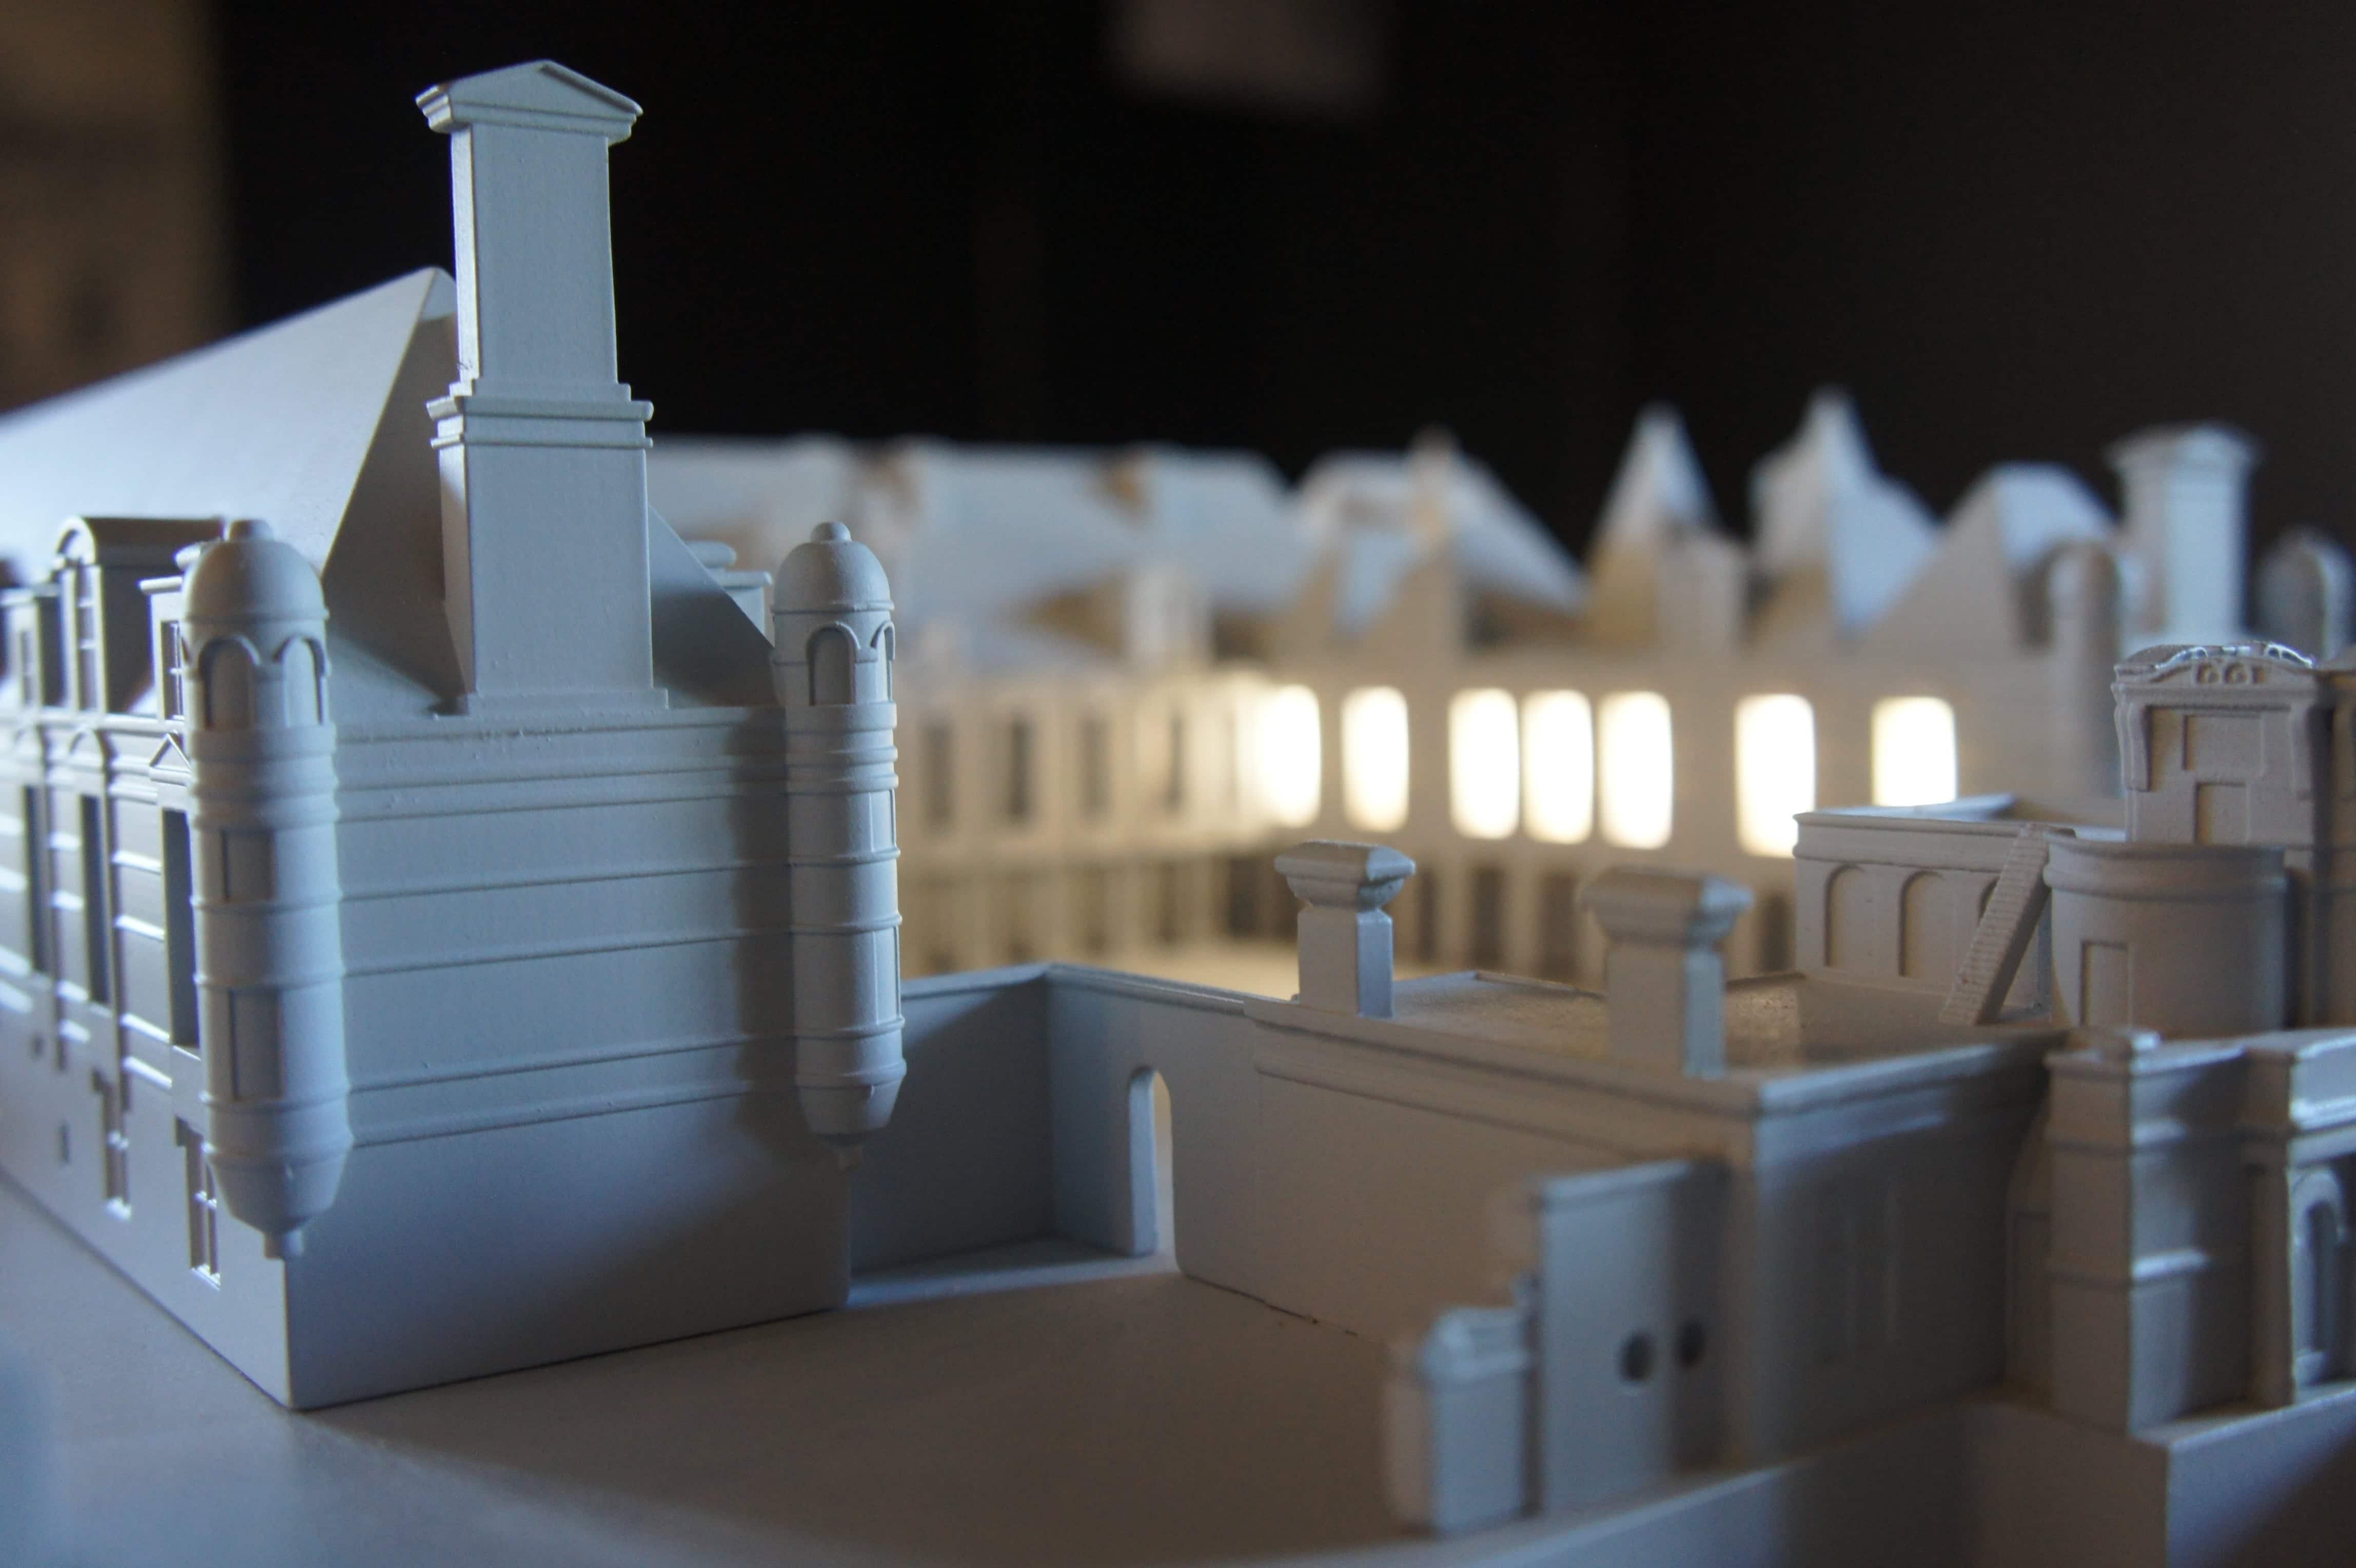 Château d'Anet interactive model